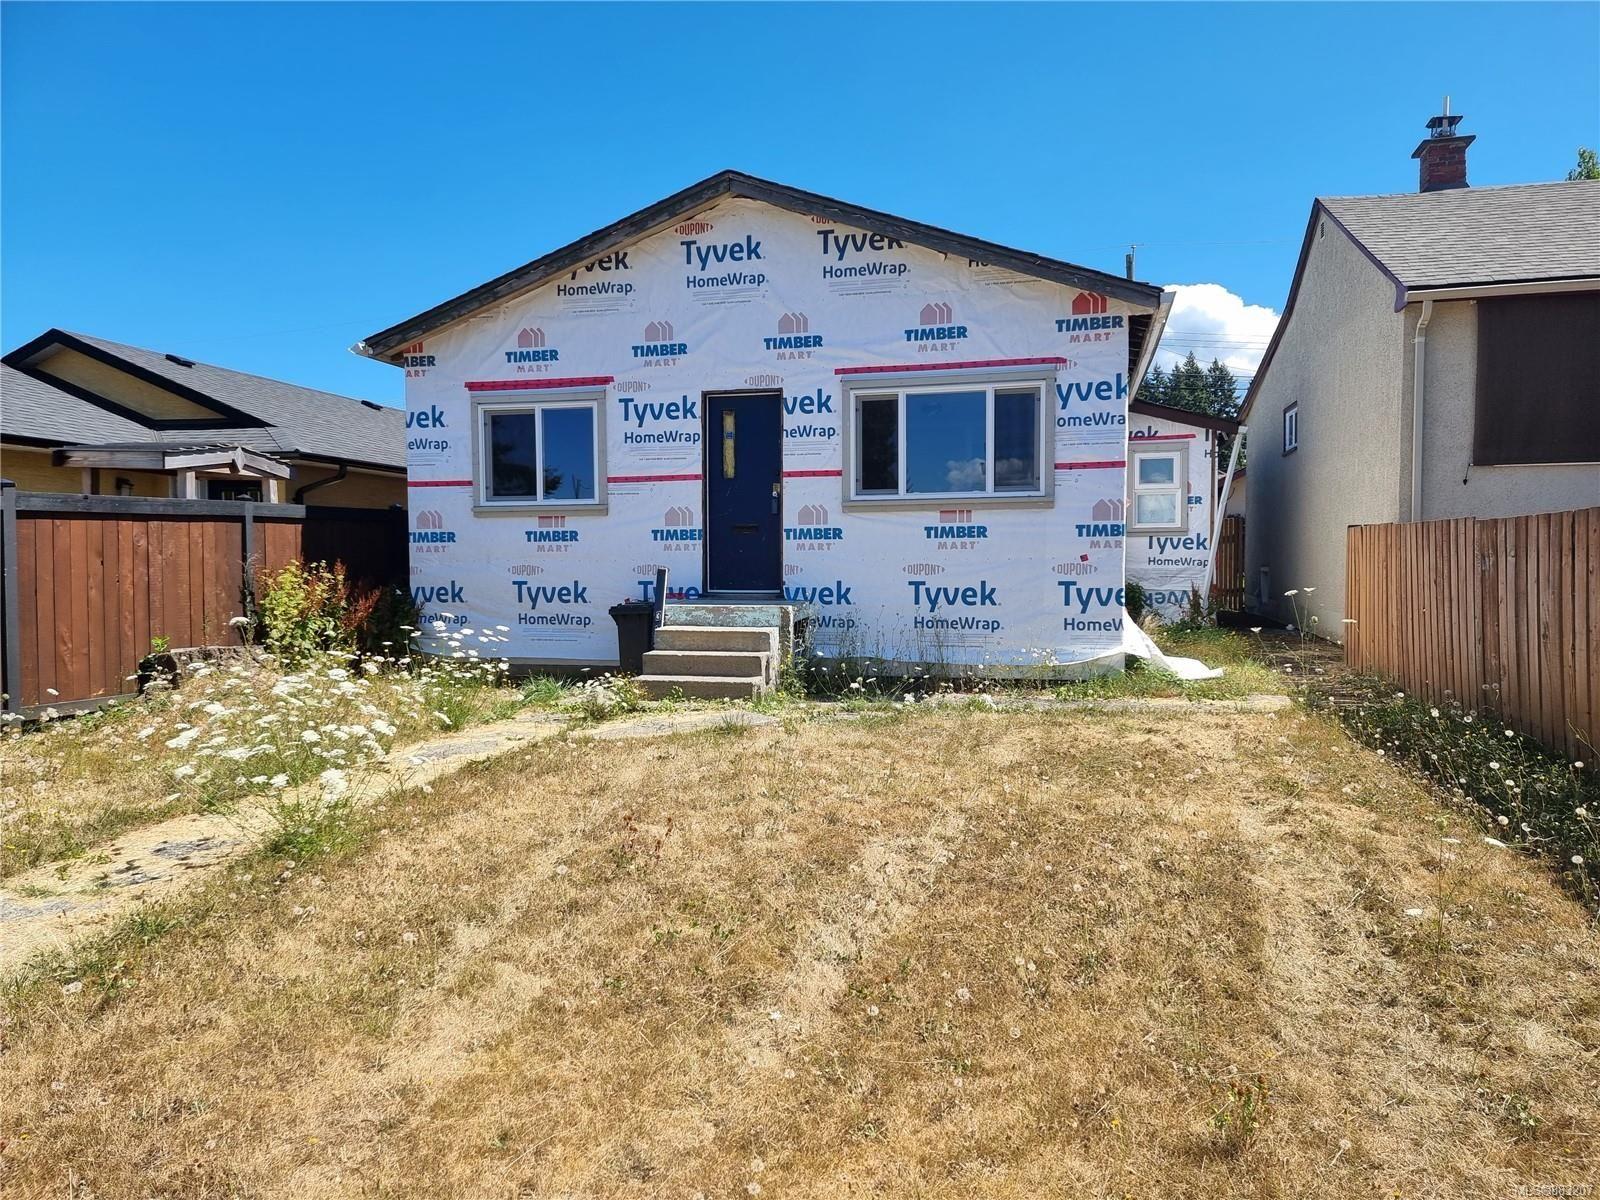 Main Photo: 3645 14th Ave in : PA Port Alberni House for sale (Port Alberni)  : MLS®# 883207